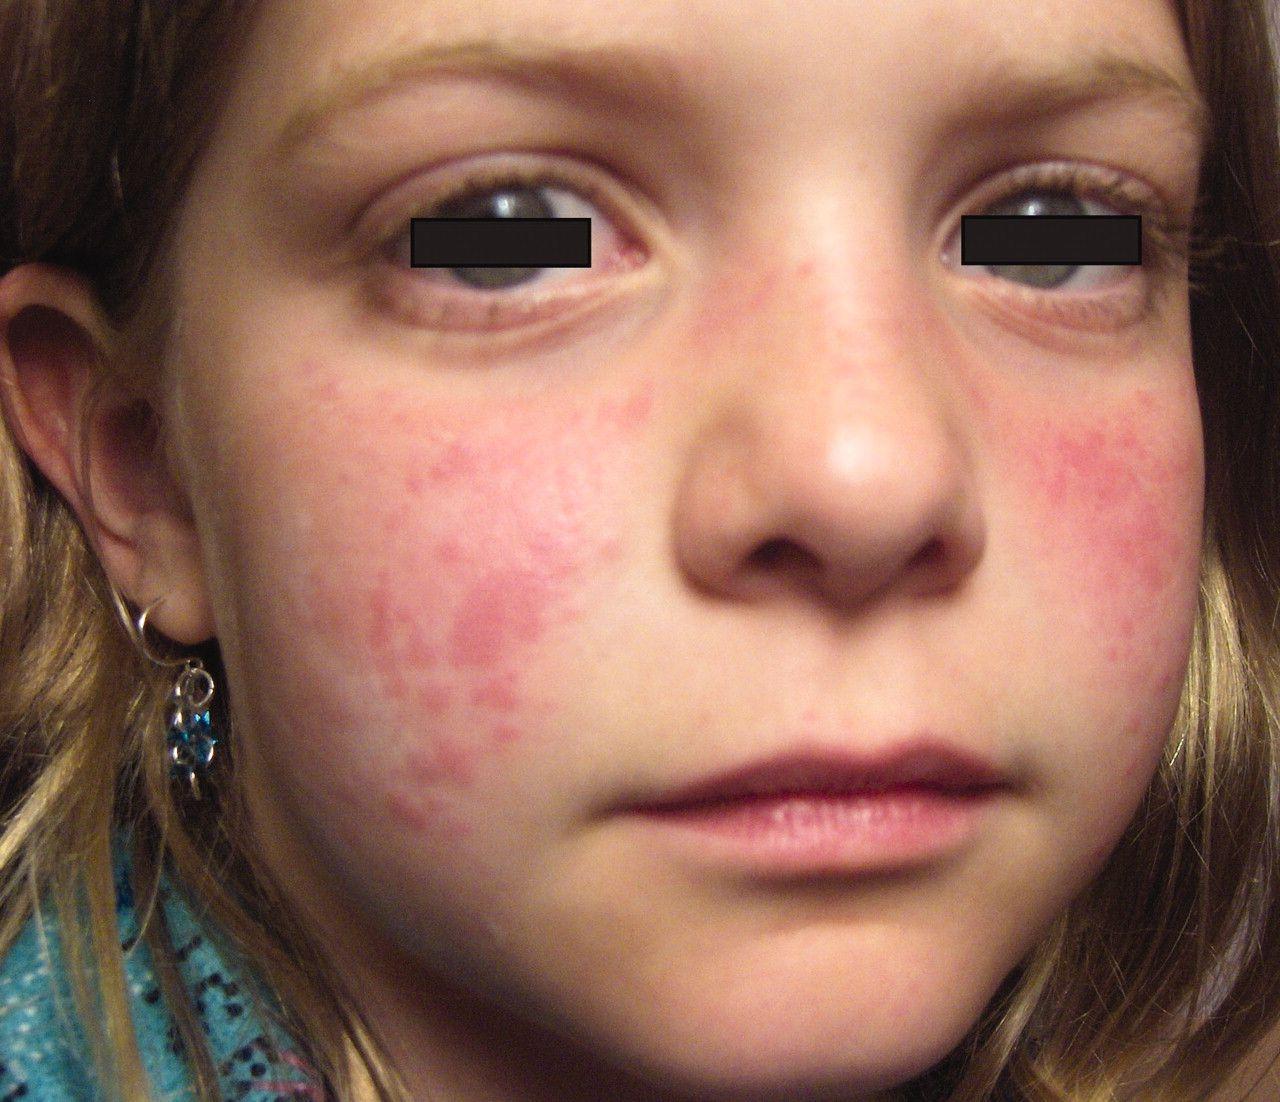 1000+ images about Juvenile Rheumatoid Arthritis on Pinterest ...